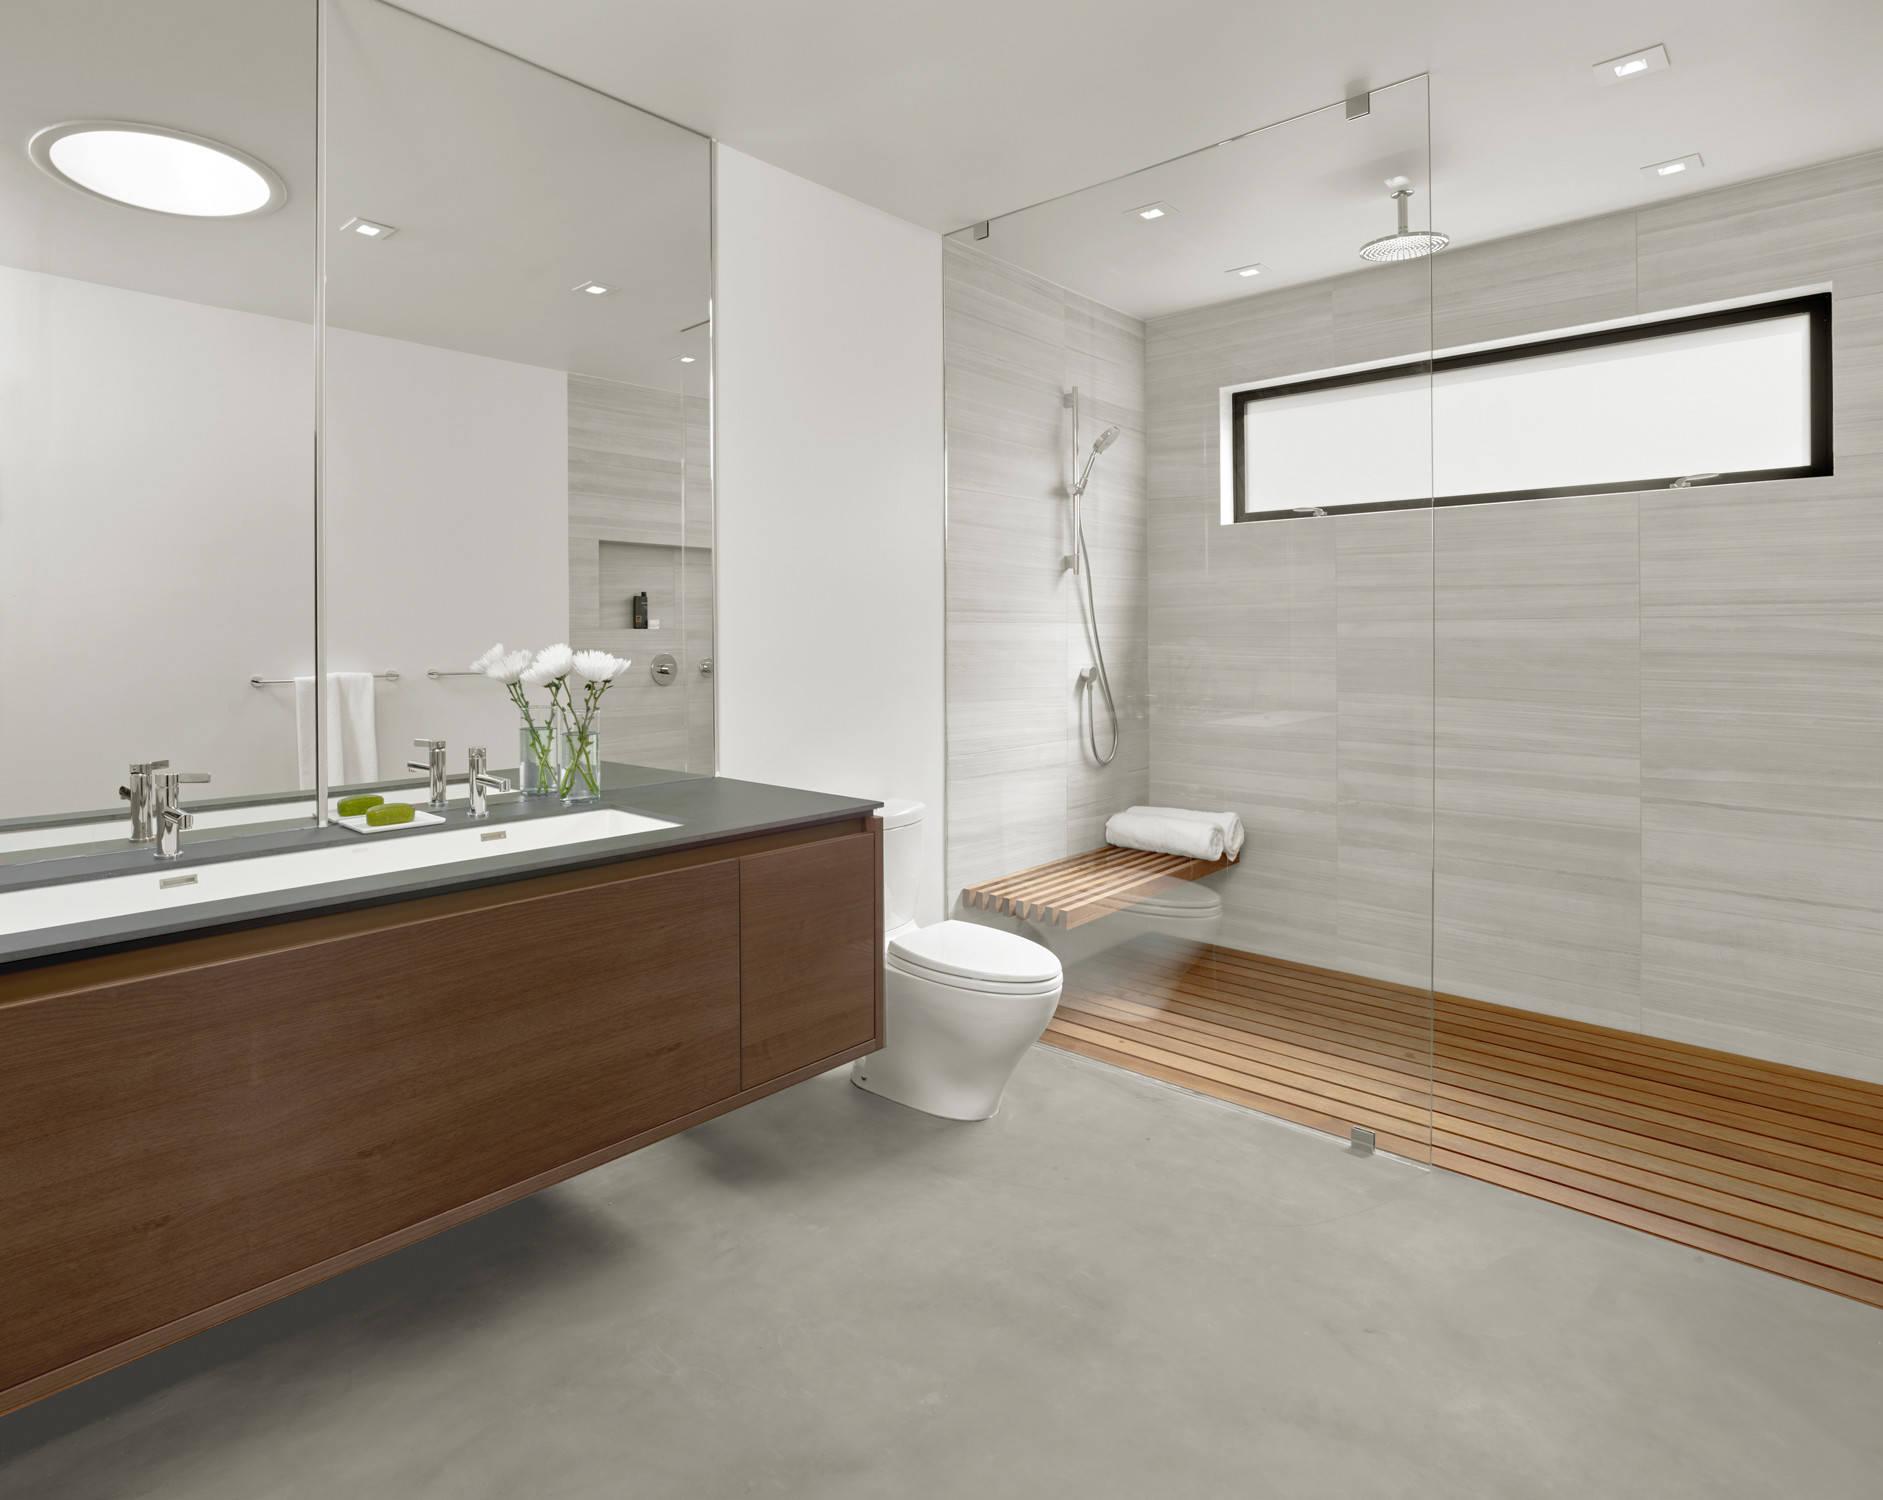 75 Beautiful Concrete Floor Bathroom, Concrete Floor Bathroom Ideas